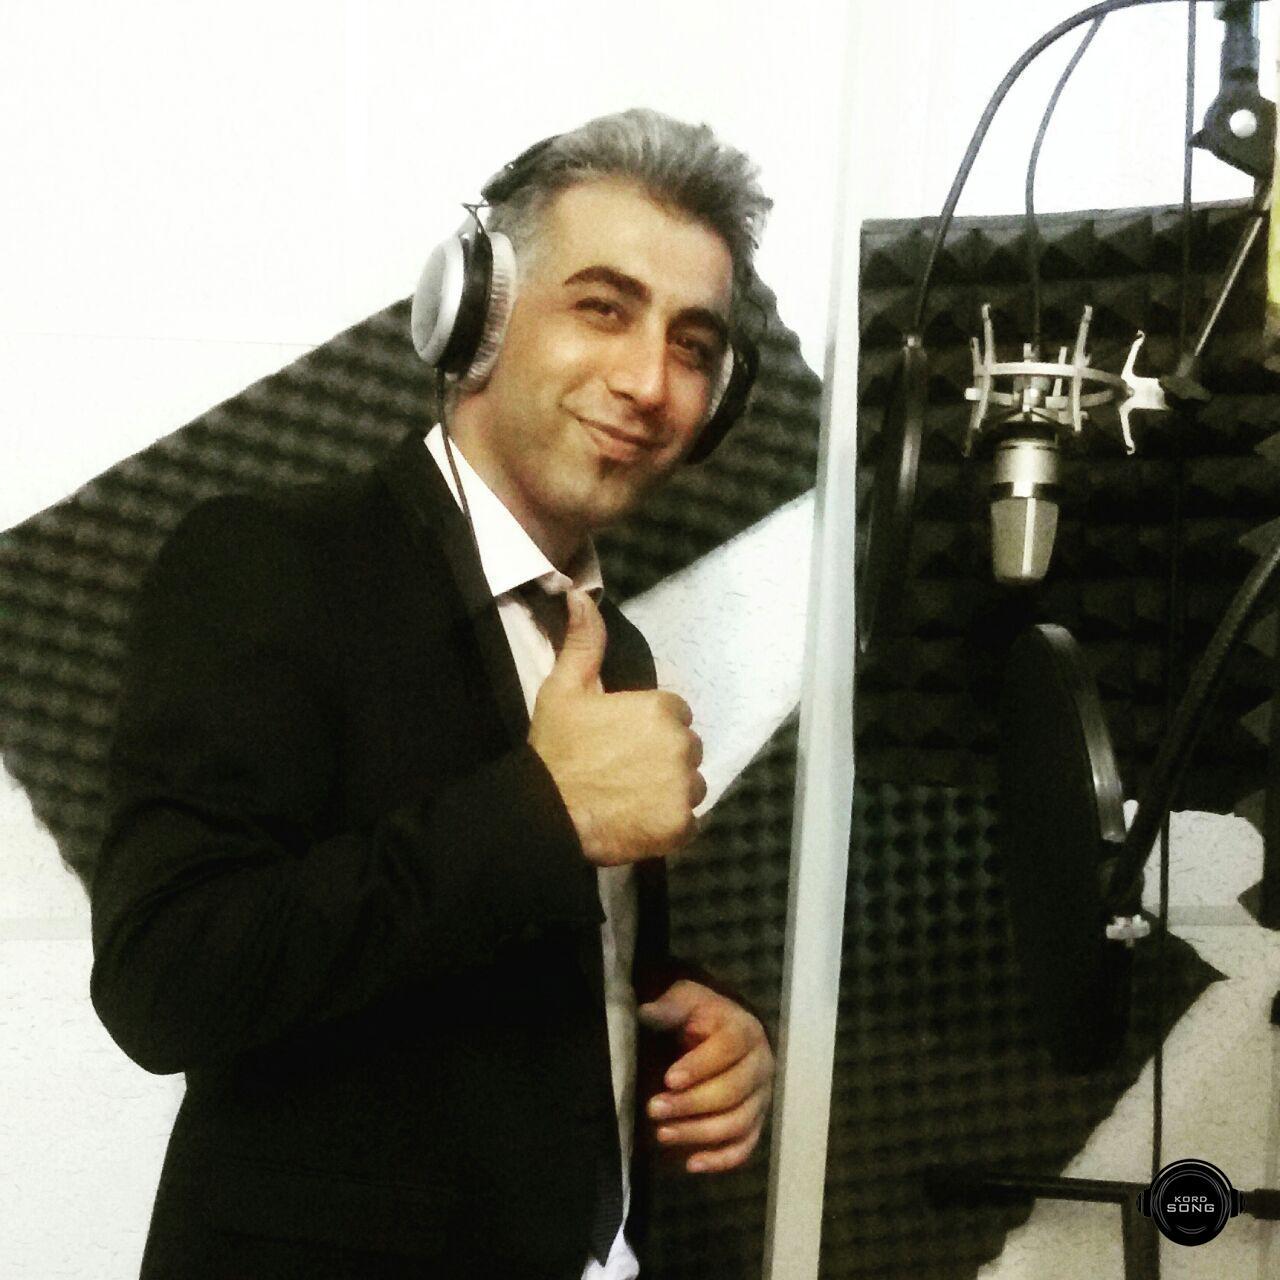 p4ly photo ۲۰۱۷ ۱۲ ۰۱ ۱۴ ۴۳ ۴۷ - دانلود آهنگ سیاوش اکبری بنام گلاره